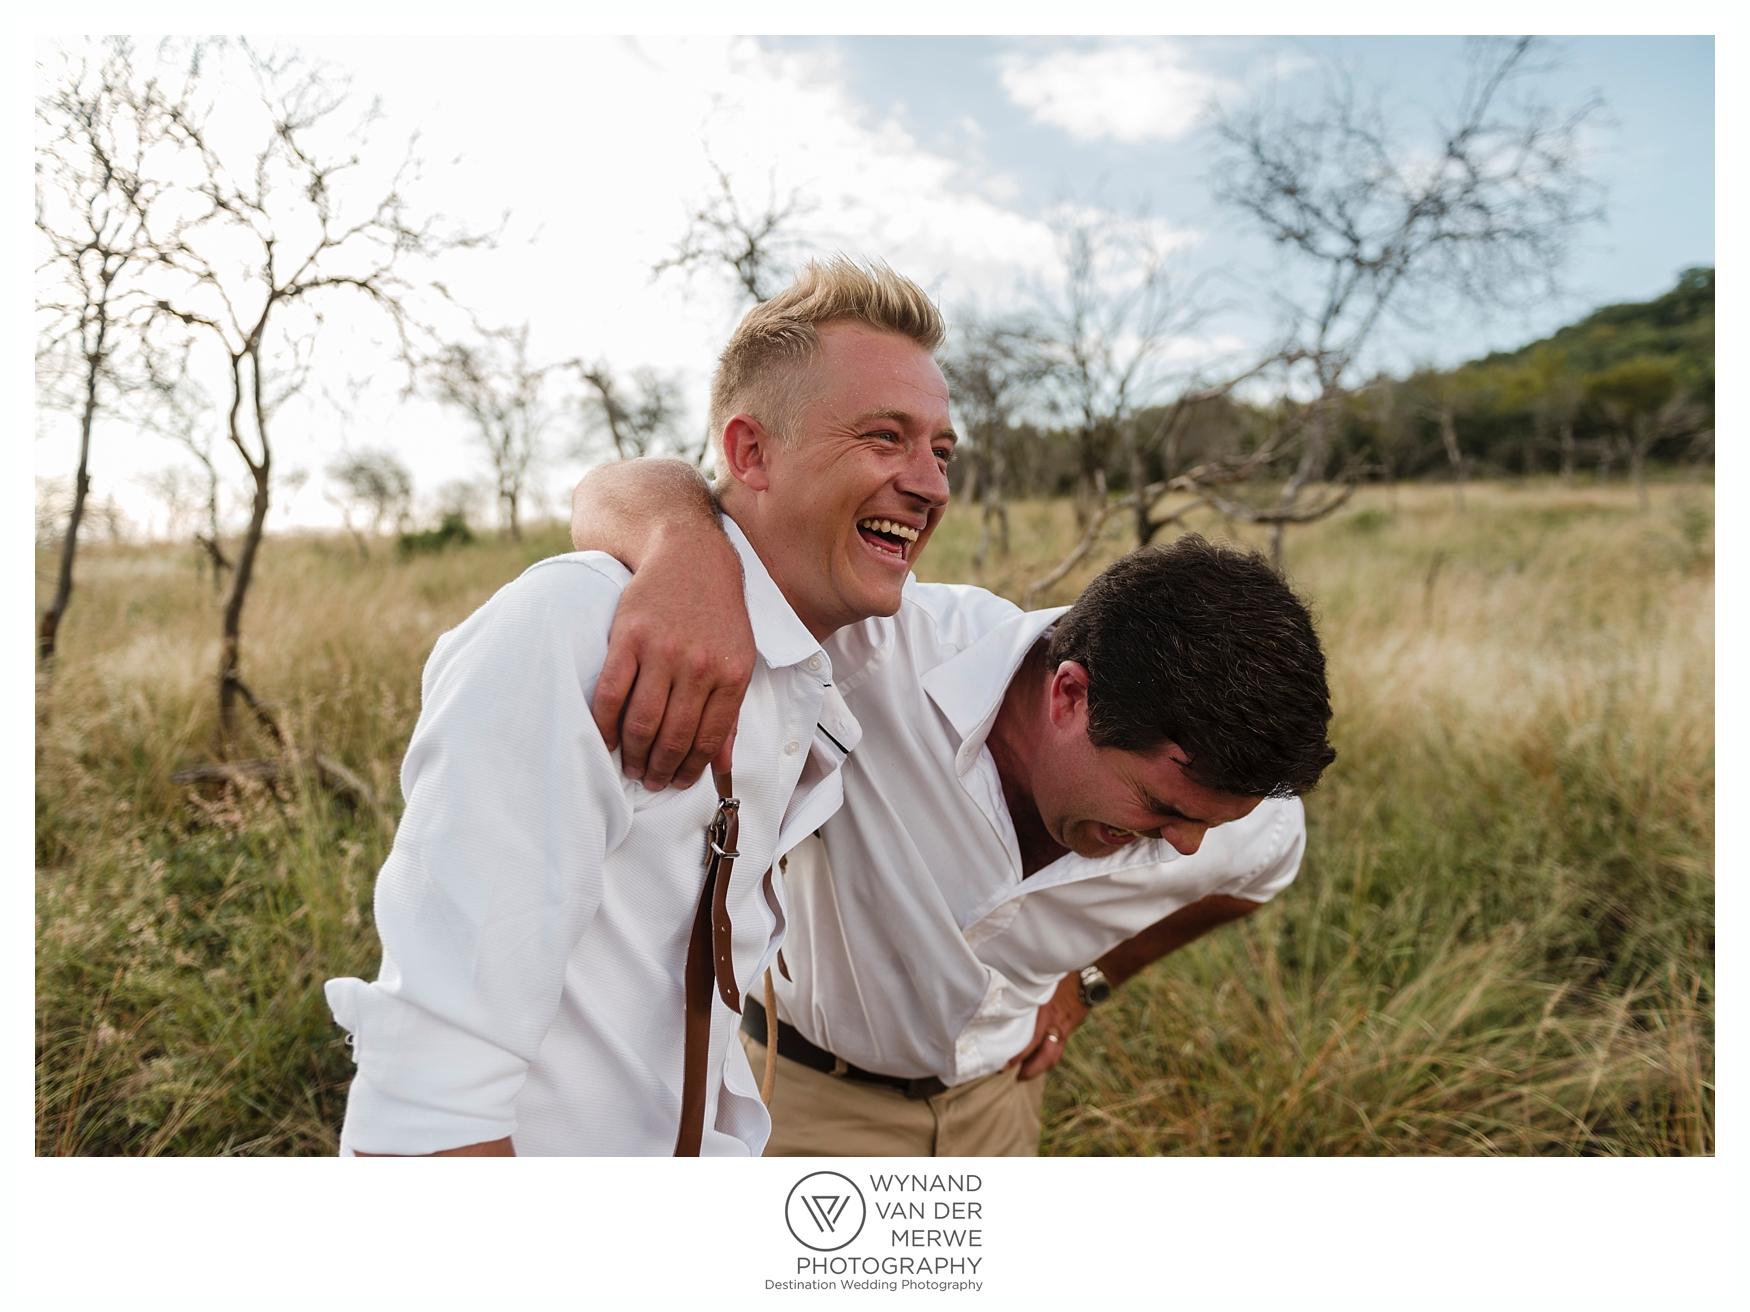 WynandvanderMerwe_weddingphotography_bushveldwedding_northam_bushveld_limpopowedding_limpopo_southafrica-170.jpg